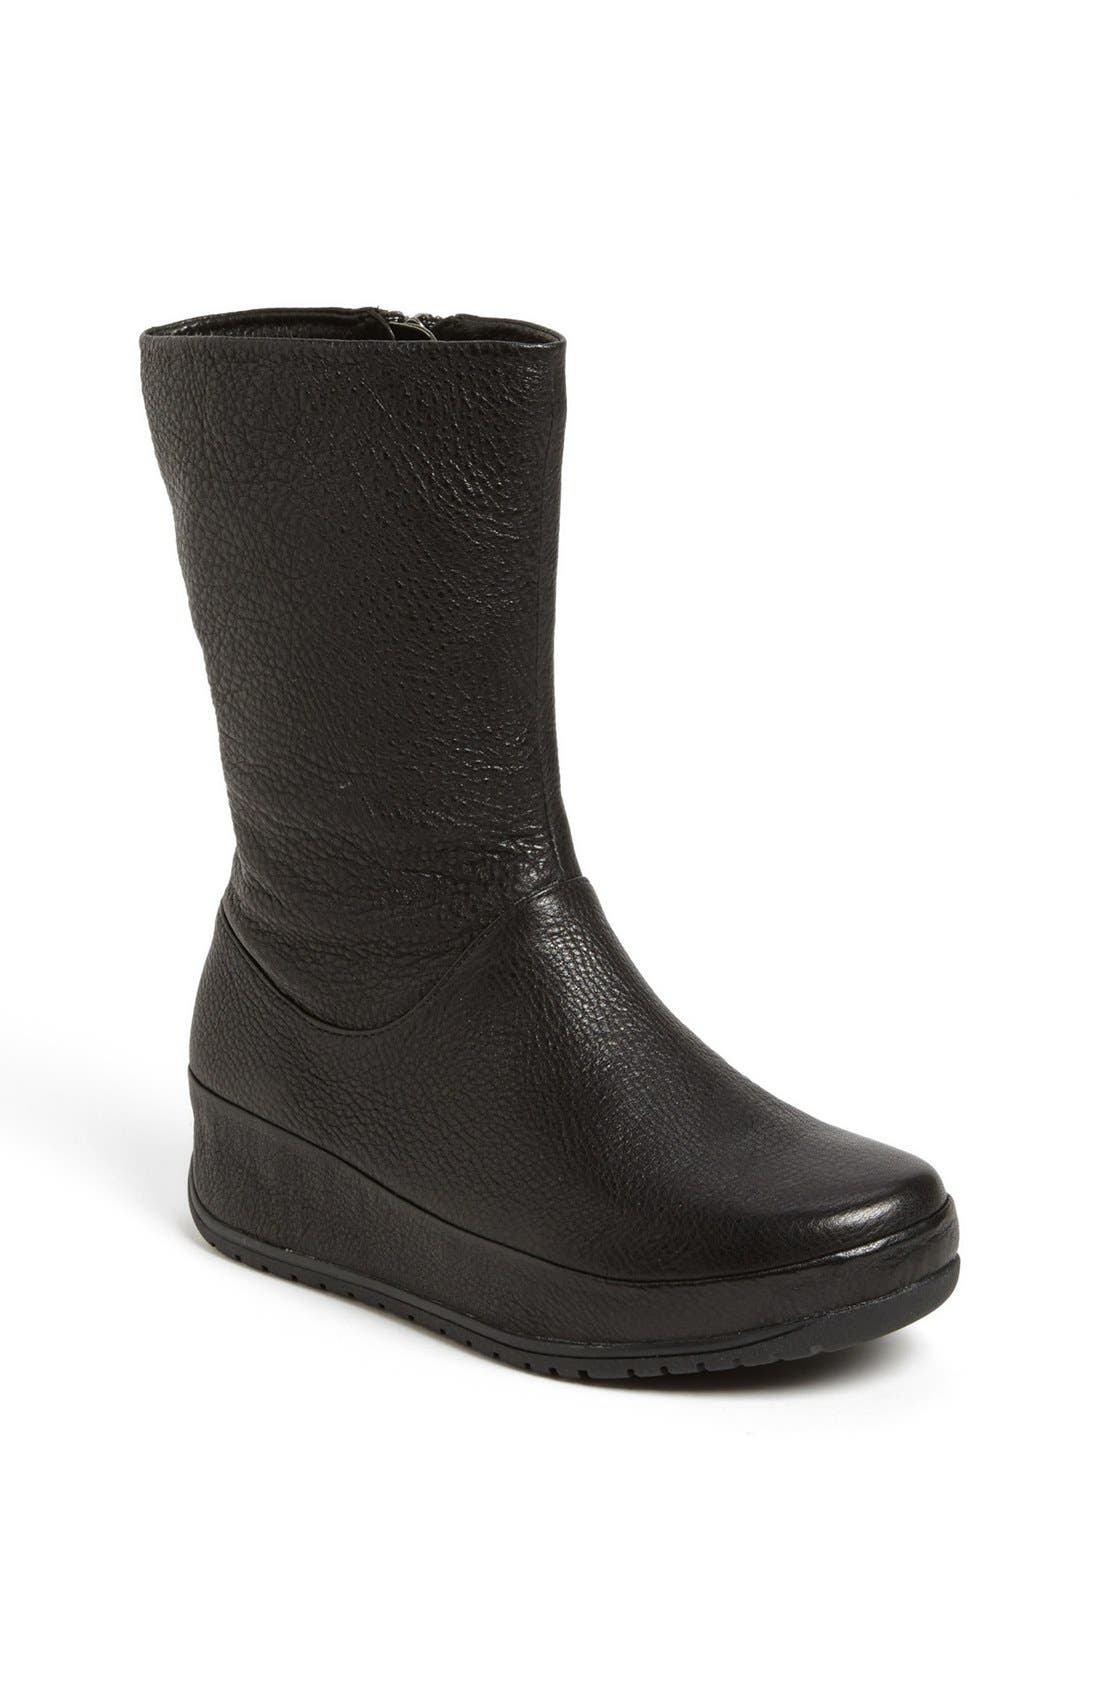 Main Image - FitFlop 'Joplin' Leather Boot